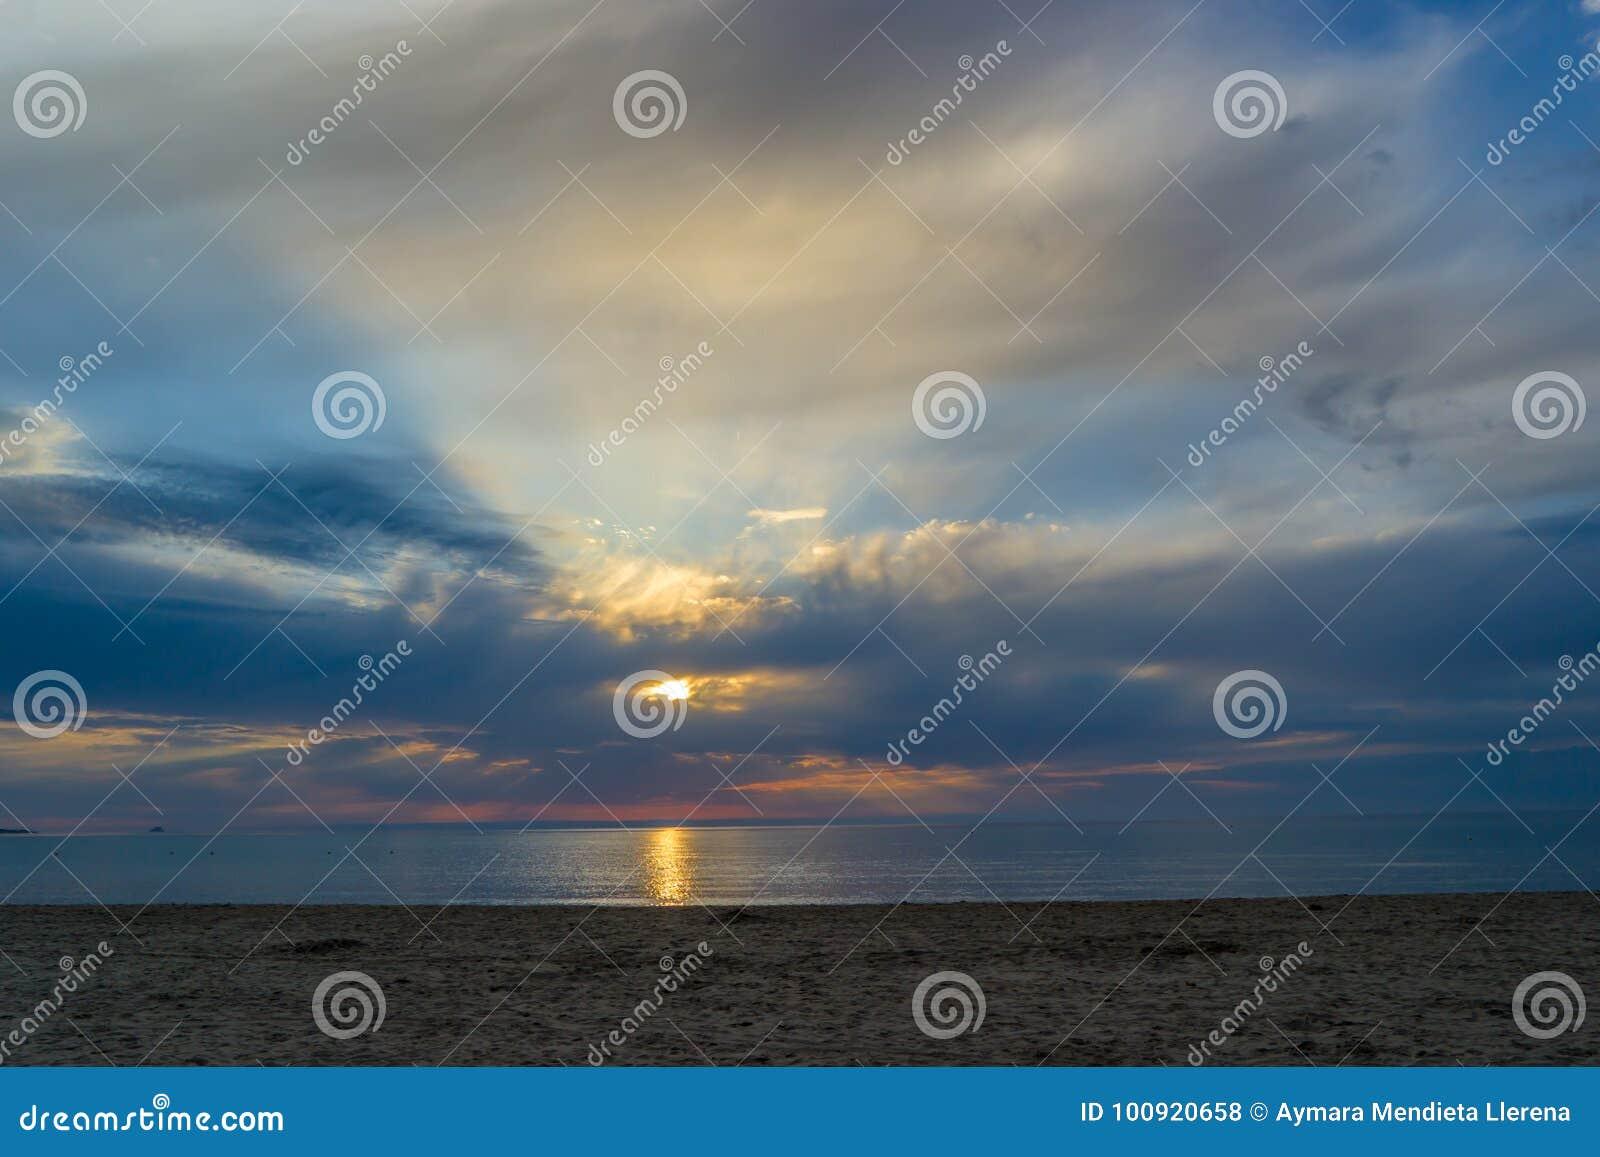 La Cinta Beach, Divine dawn, San Teodoro, Sardinia, Italy.